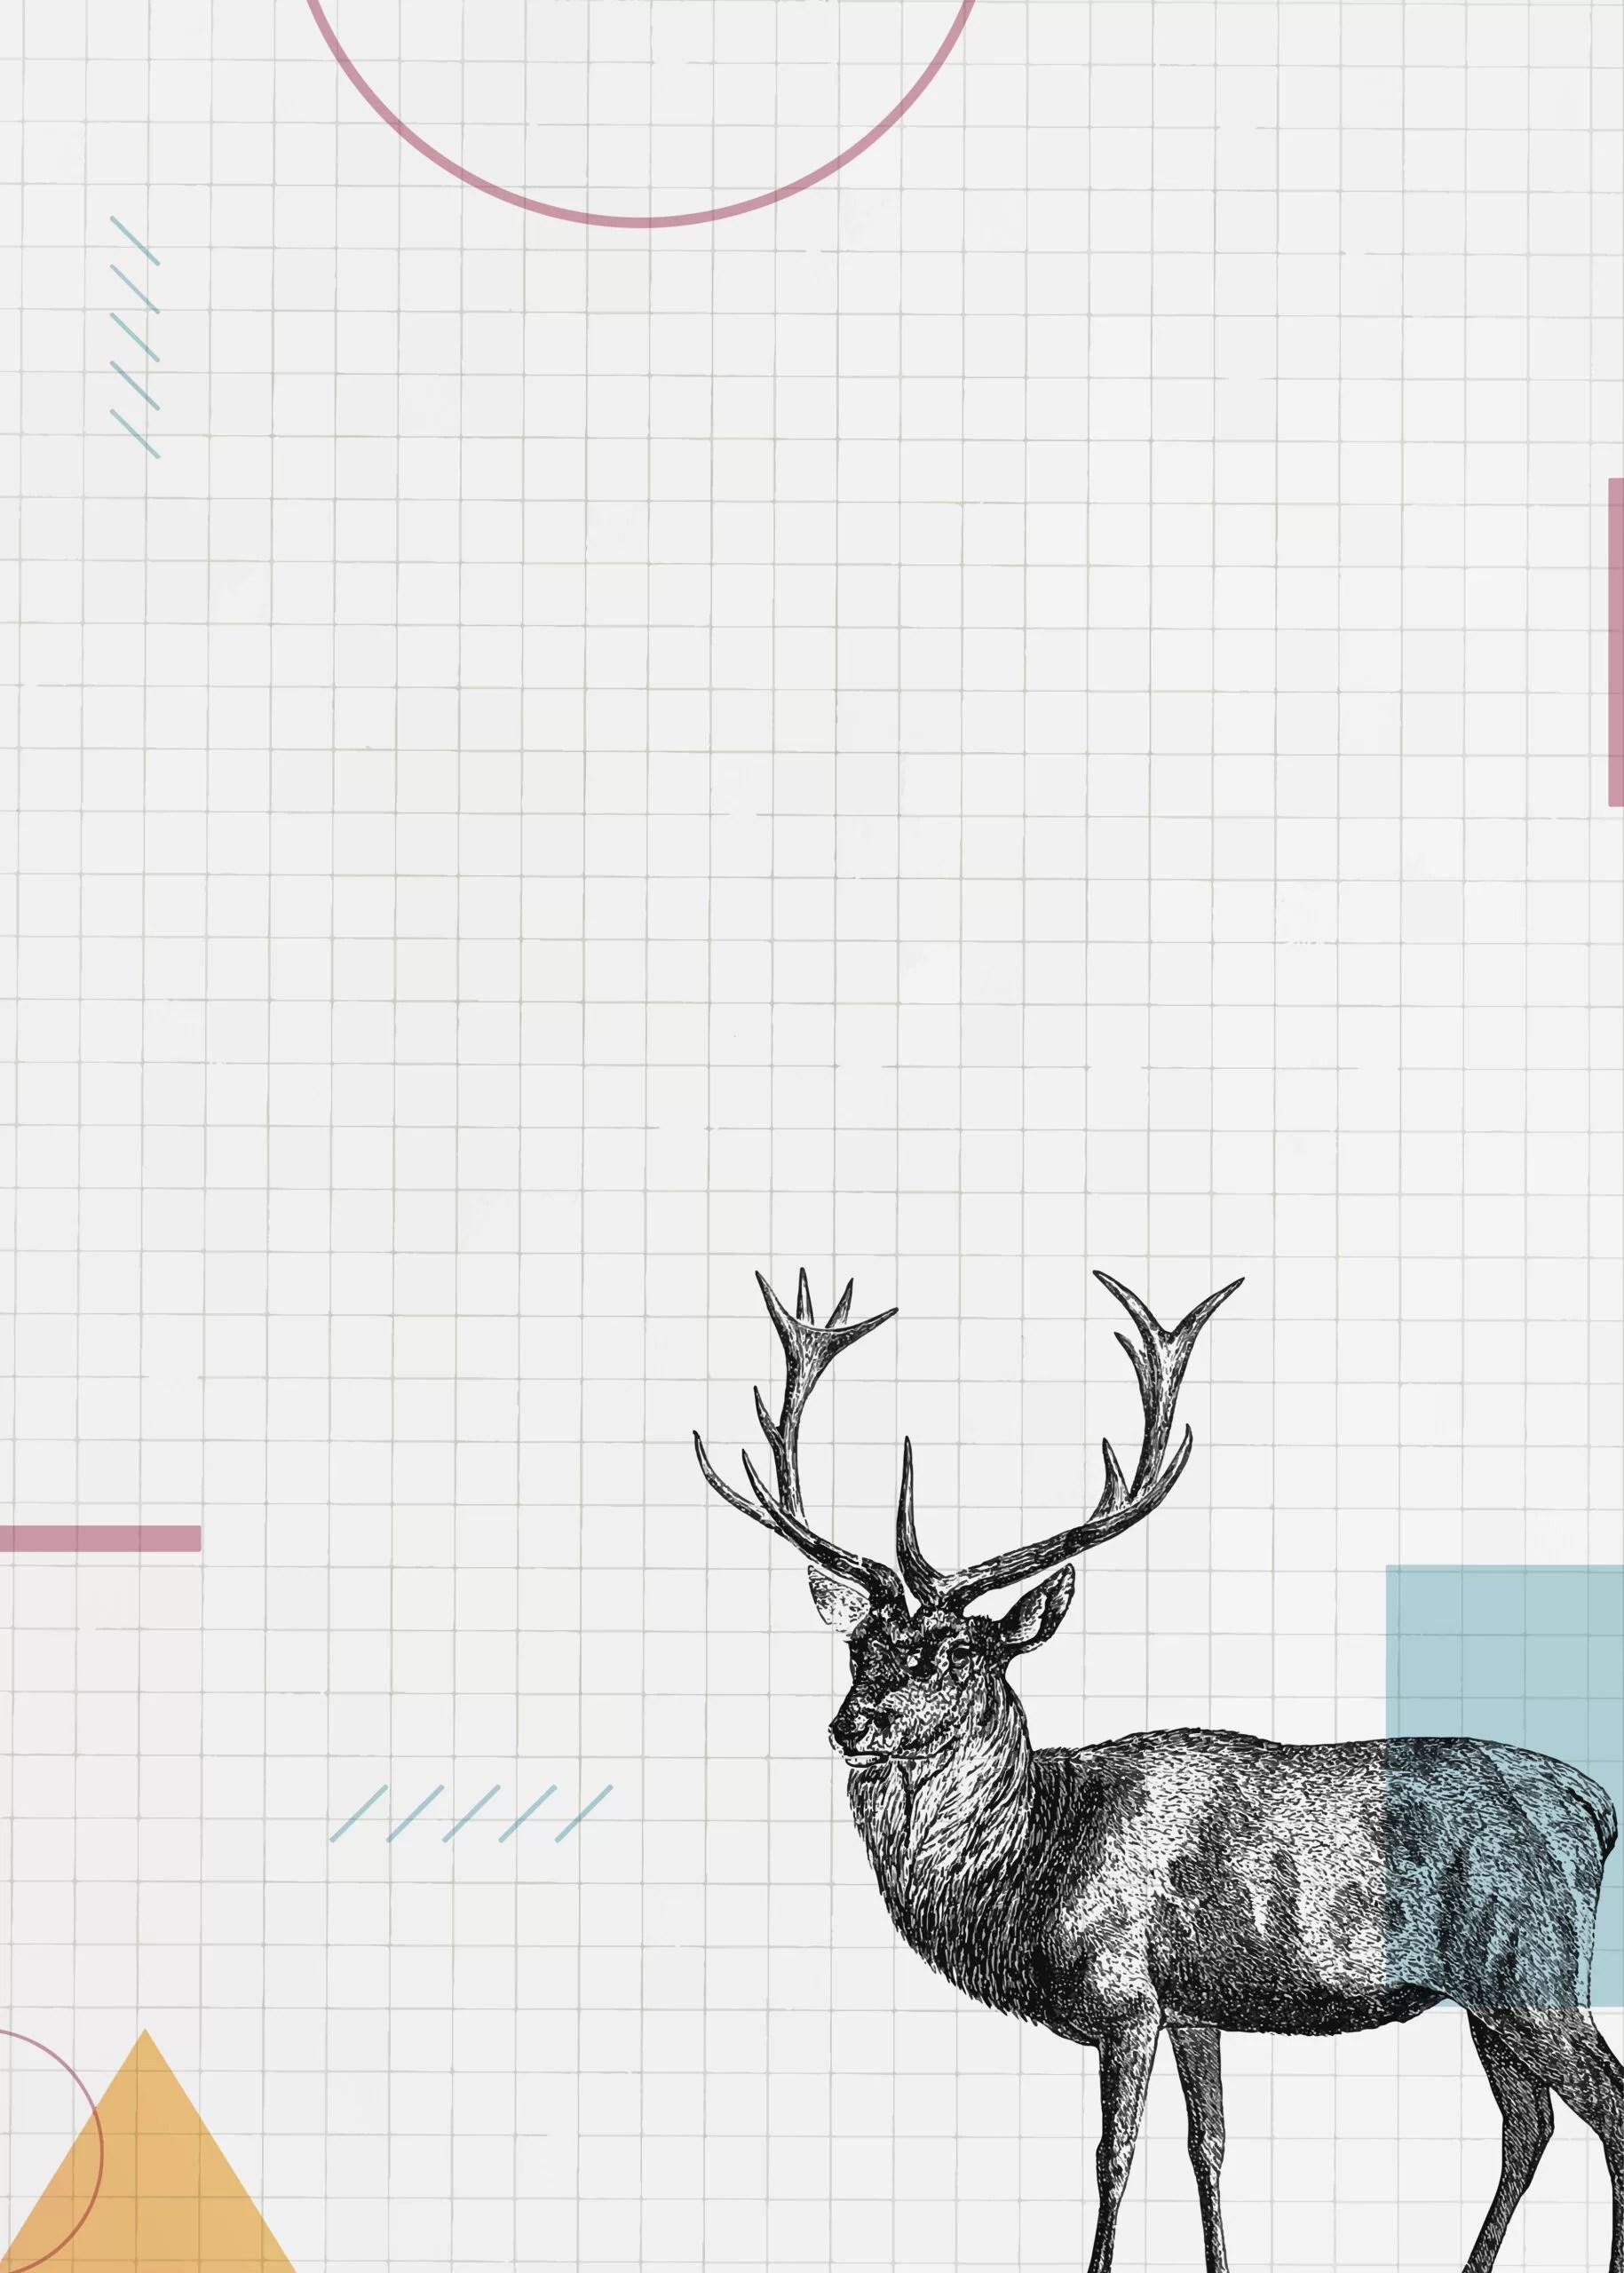 3 Effective Graphic Design Principles To Improve Your Designs